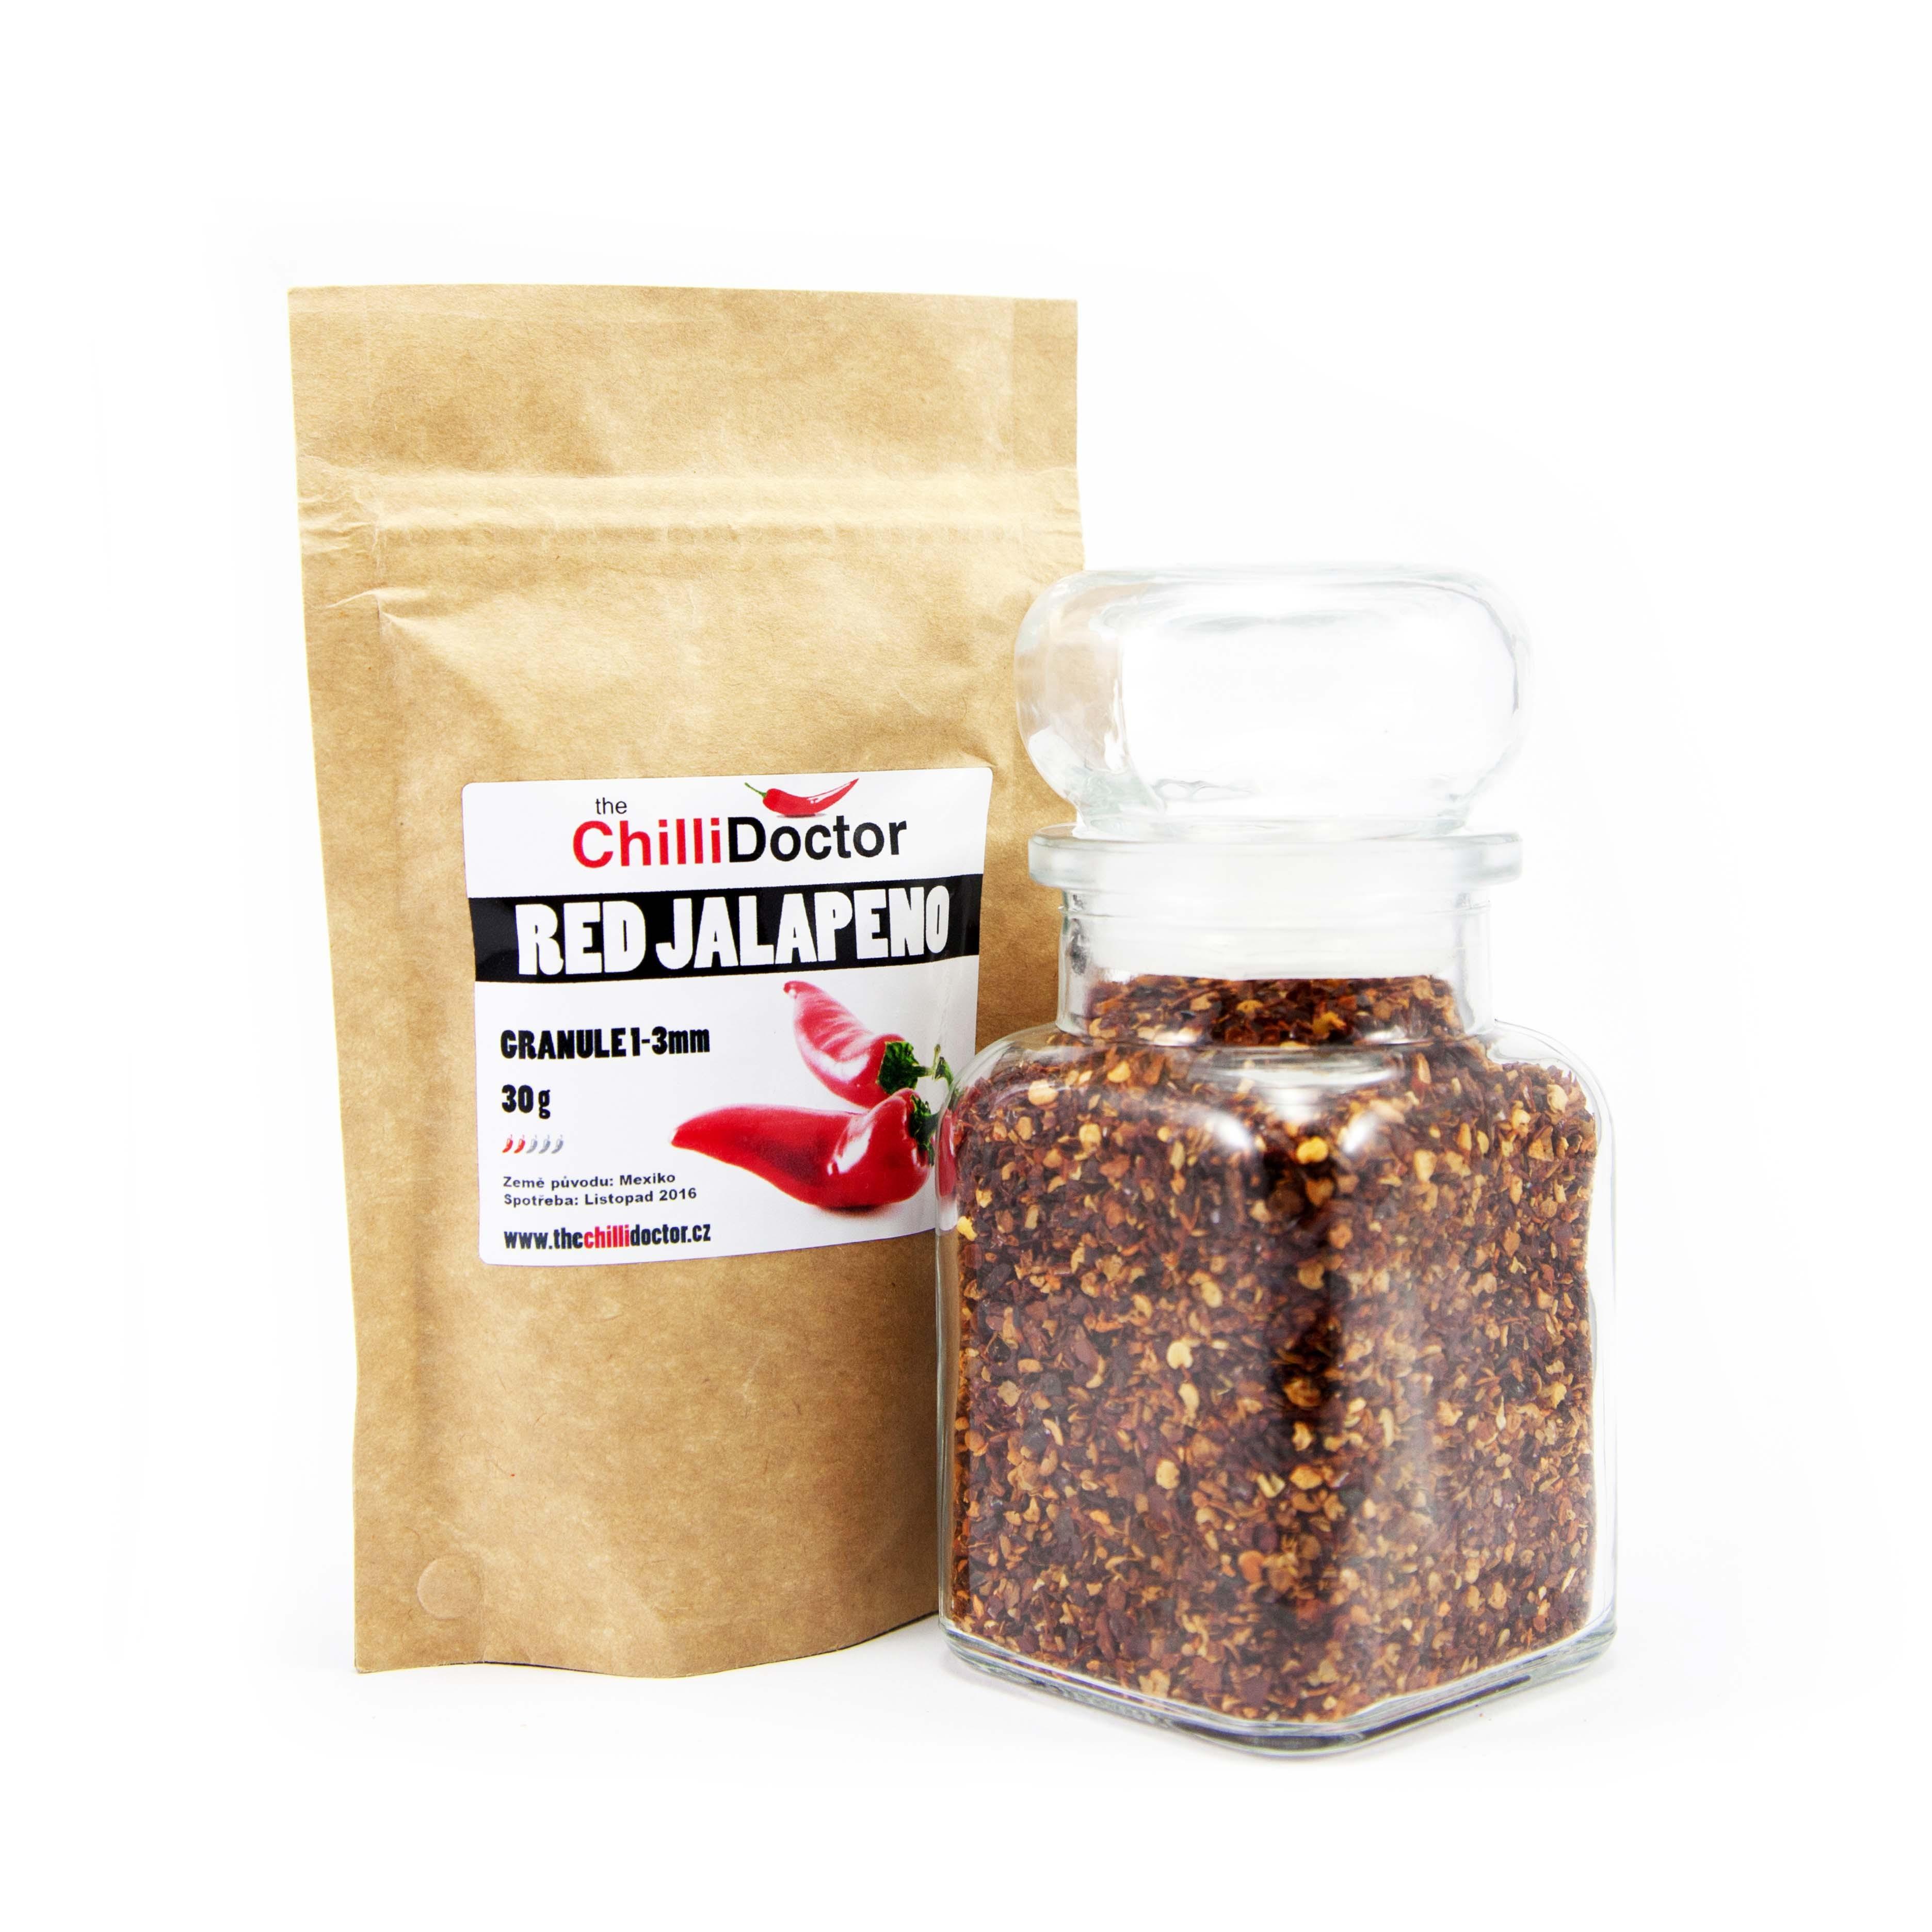 Red Jalapeno granule 30g